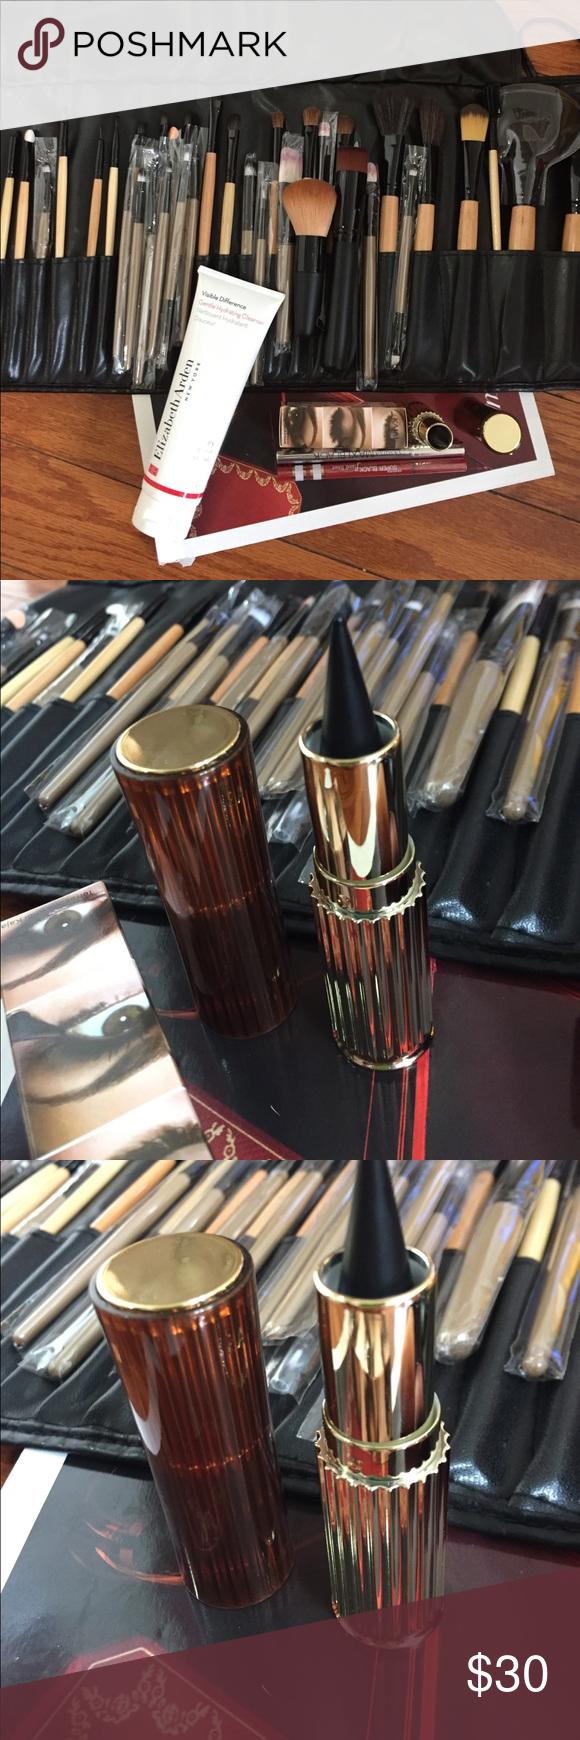 40 pieces brush set/ elizabeth arden/kajal🌺 Vegan makeup